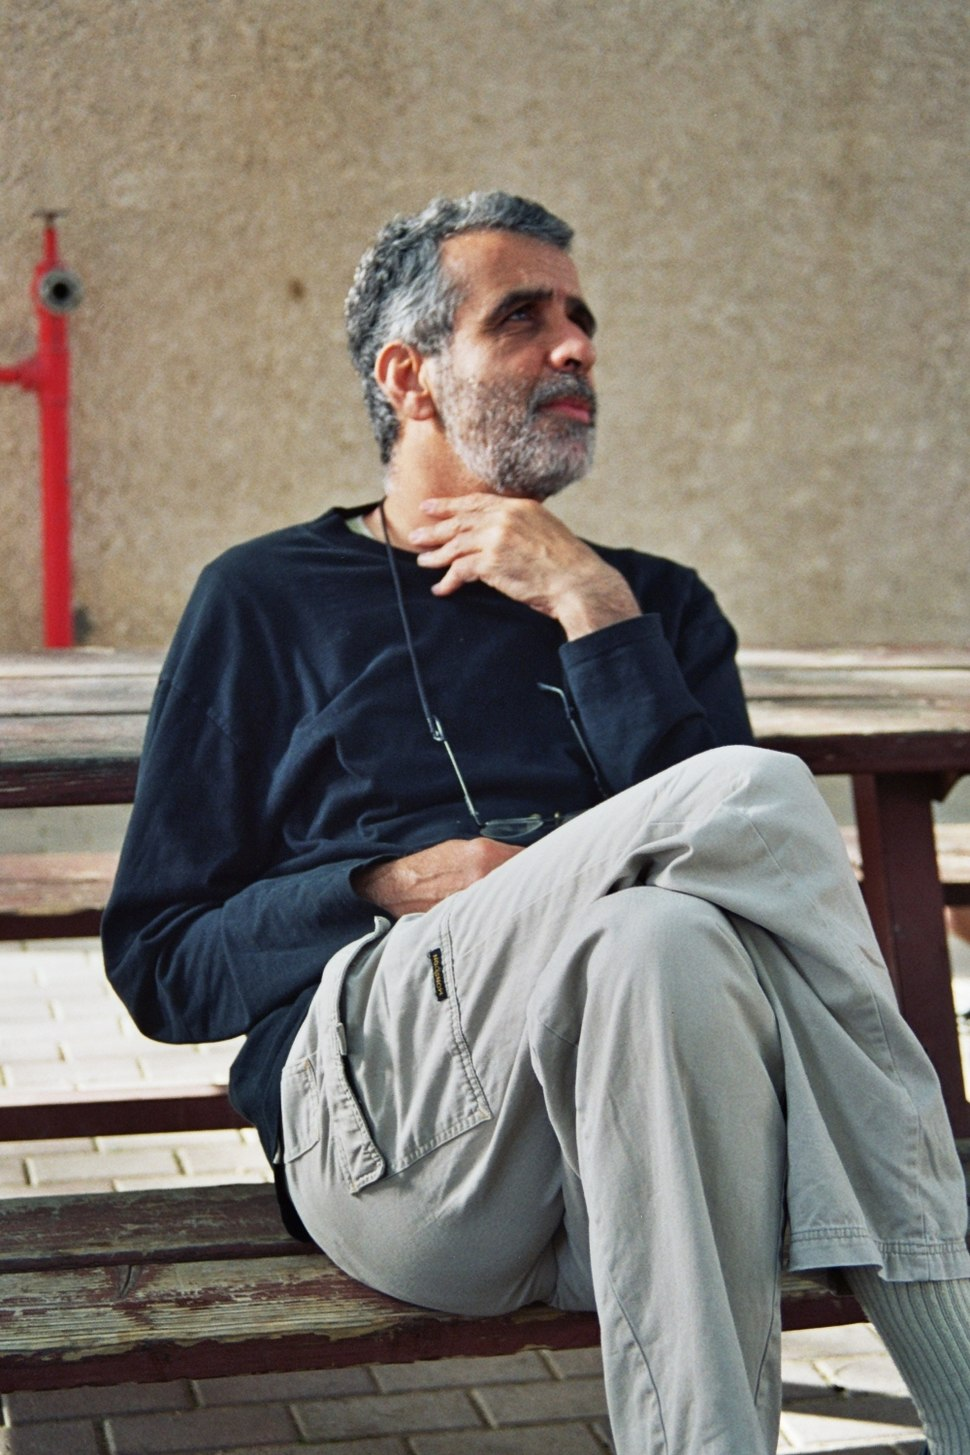 ישראל פינקלשטיין, 2007